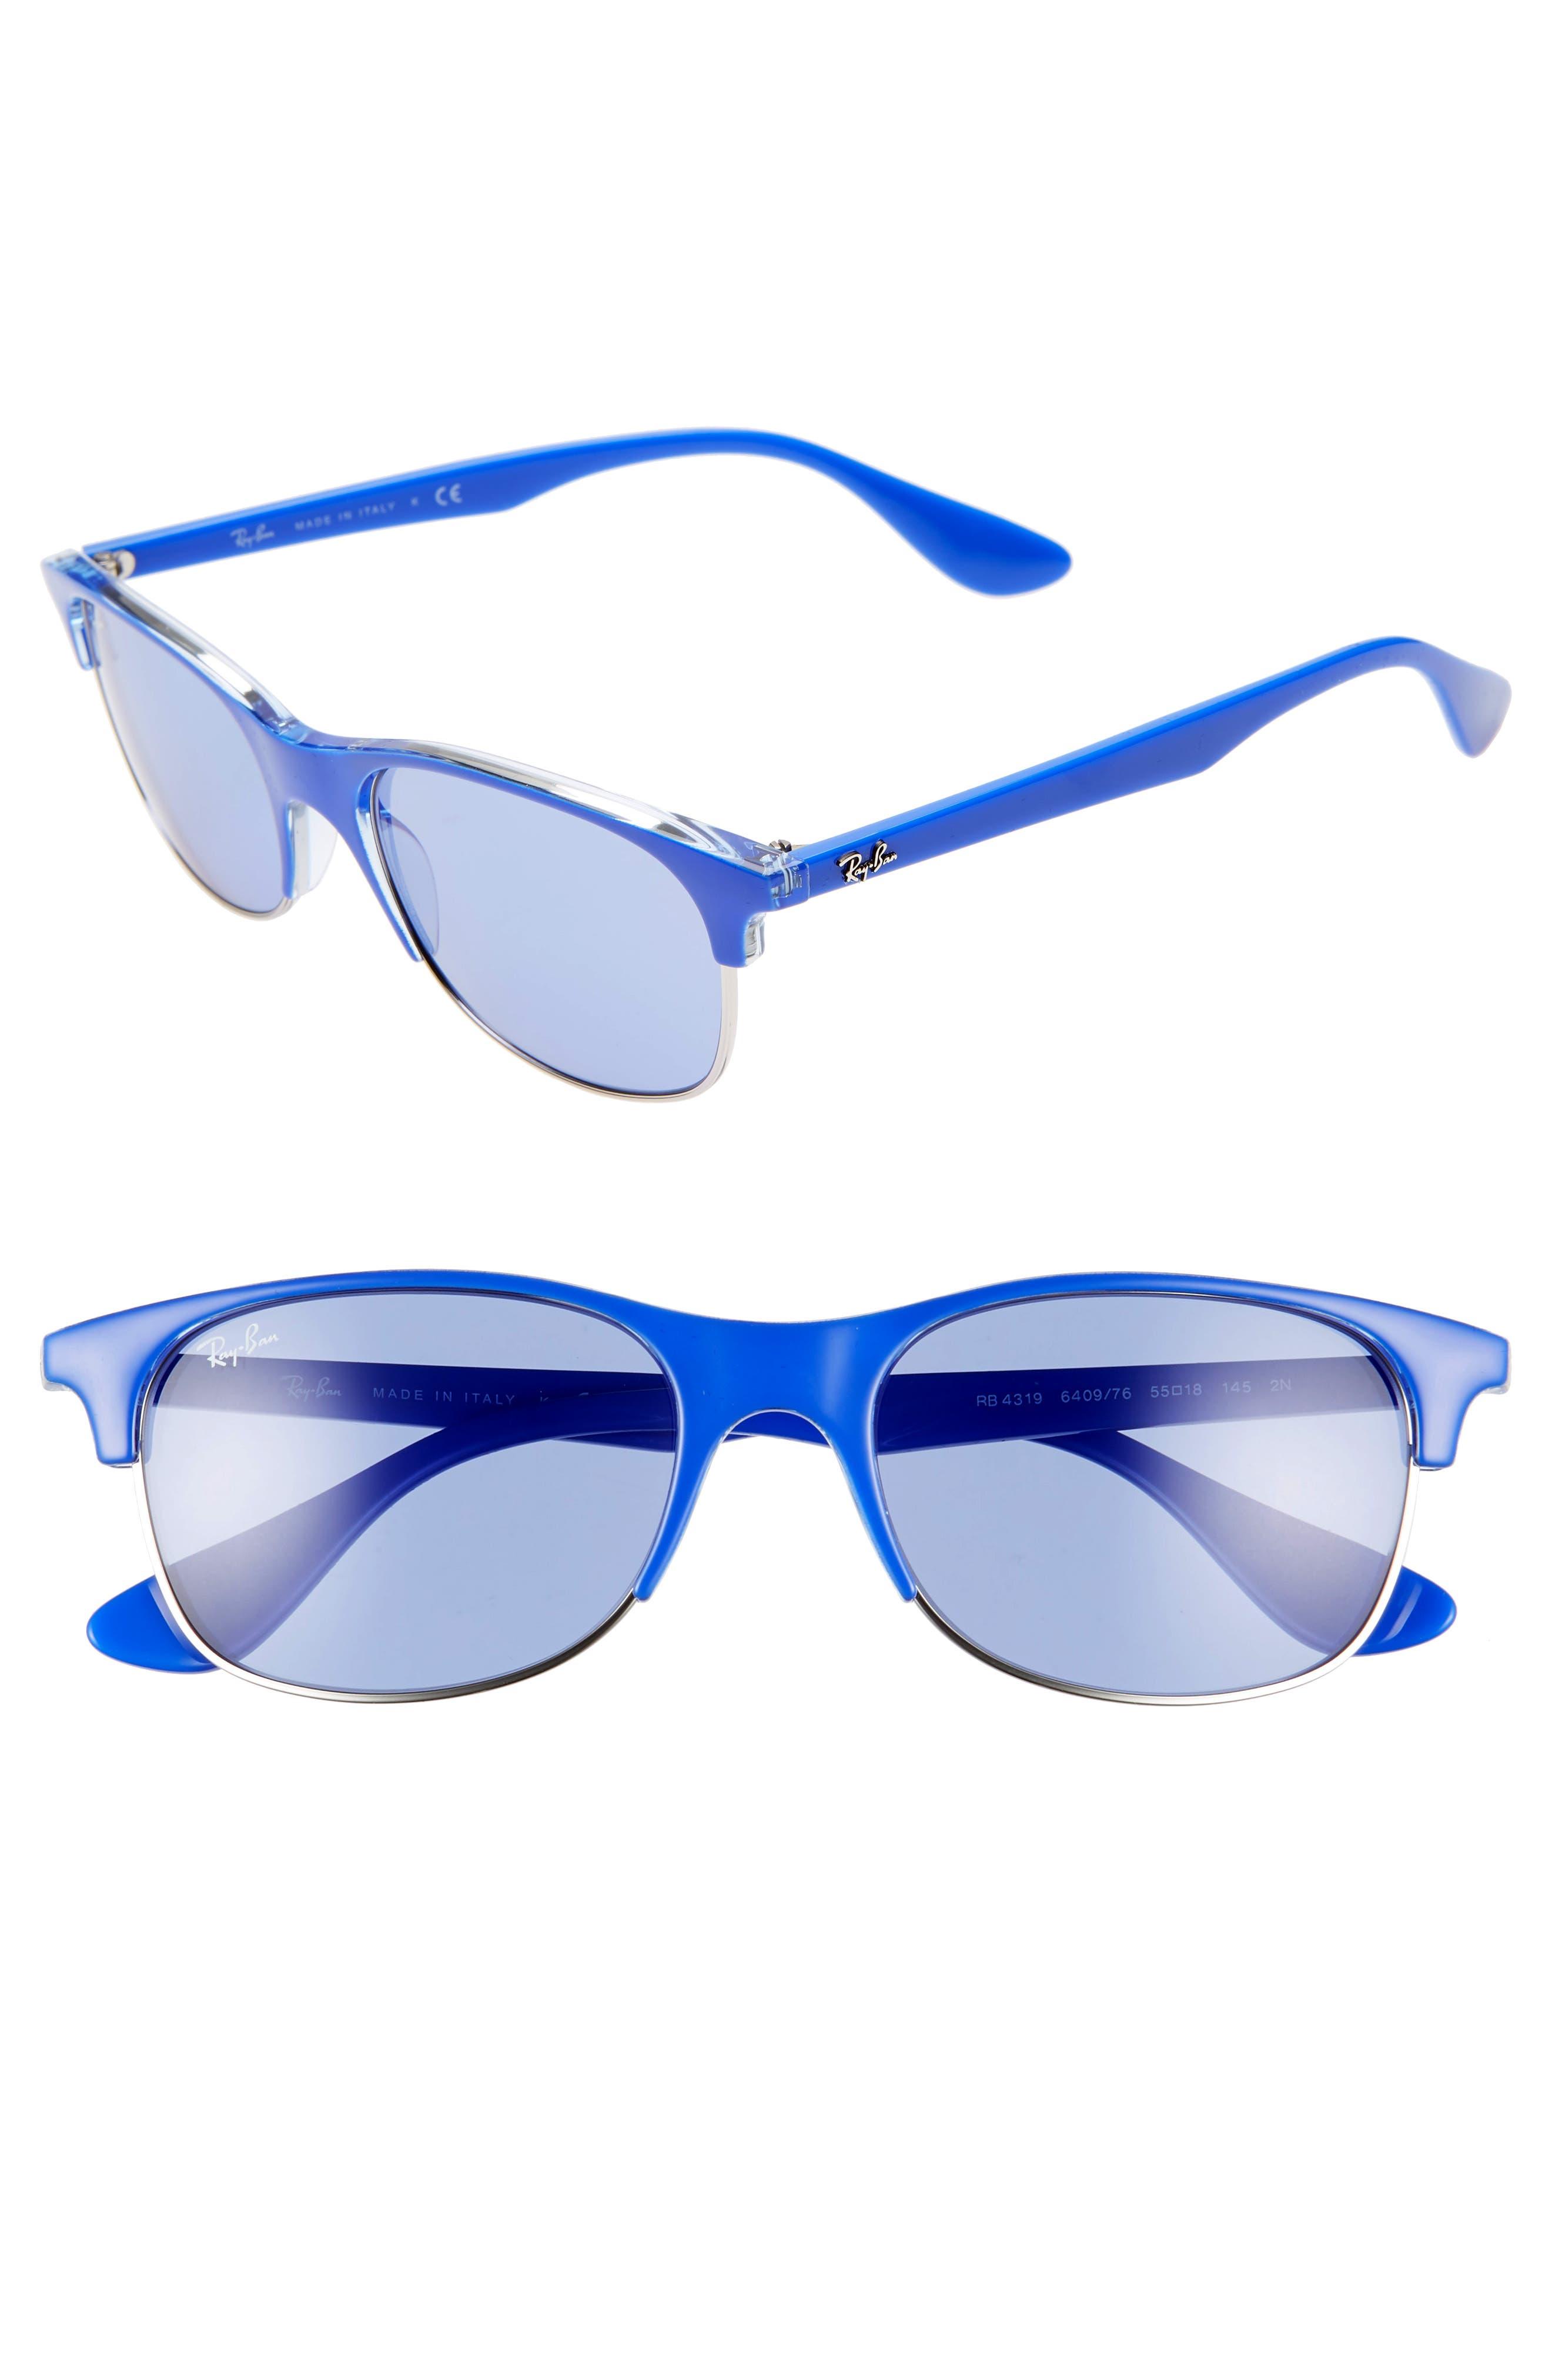 Ray-Ban 55Mm Sunglasses -